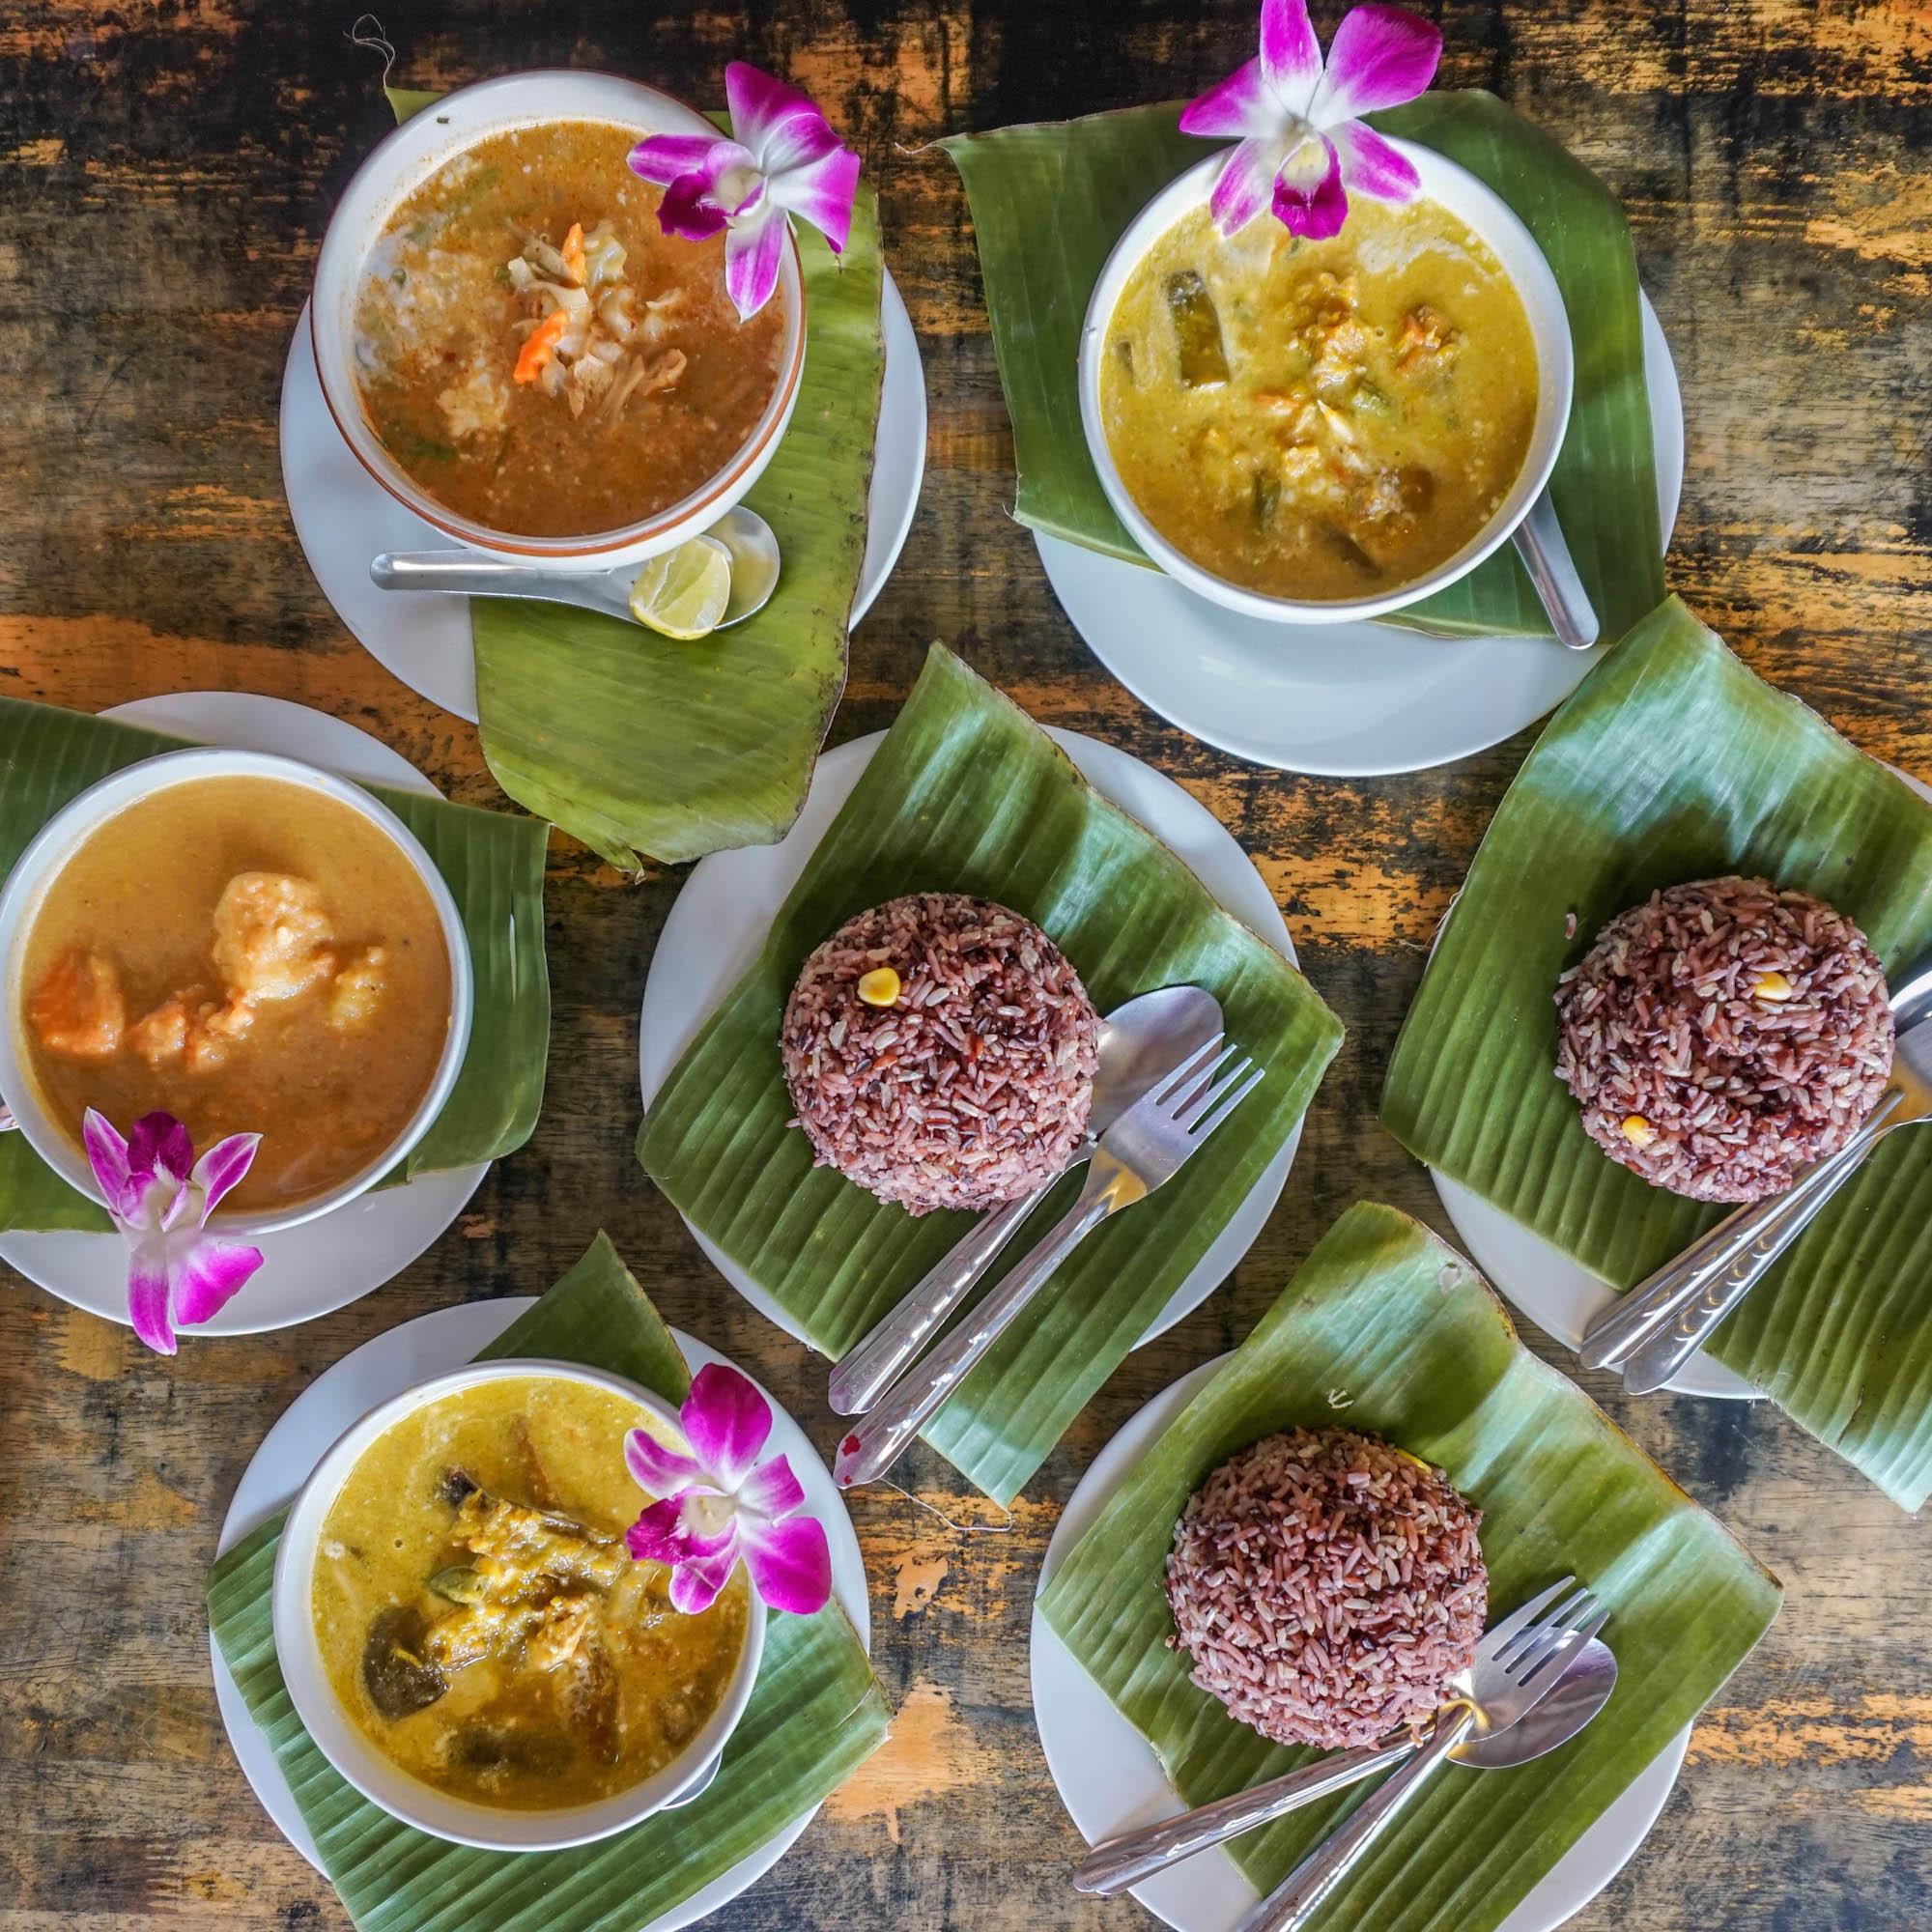 Vegan Guide to Koh Phangan - The Tasty K